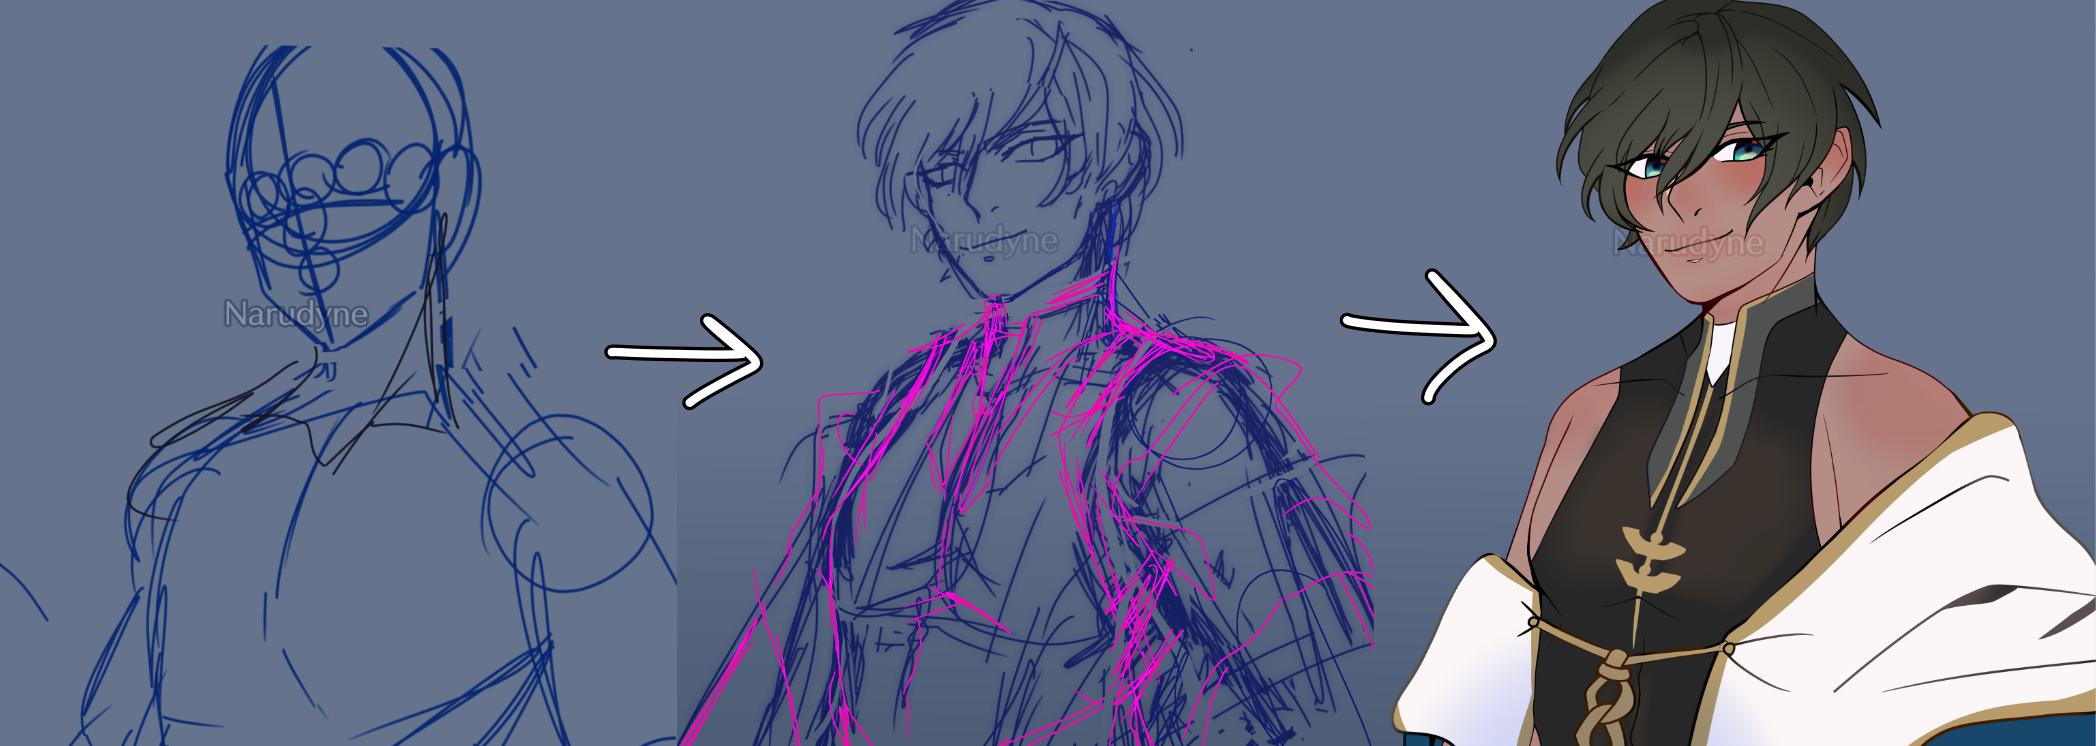 Yo it's Simeonnn Illust of ɴᴀʀᴜᴅʏɴᴇ • sᴋ𝟾 ʙʀᴀɪɴʀᴏᴛ anime angel obeyme digital fanart thisartshouldlvlup boy